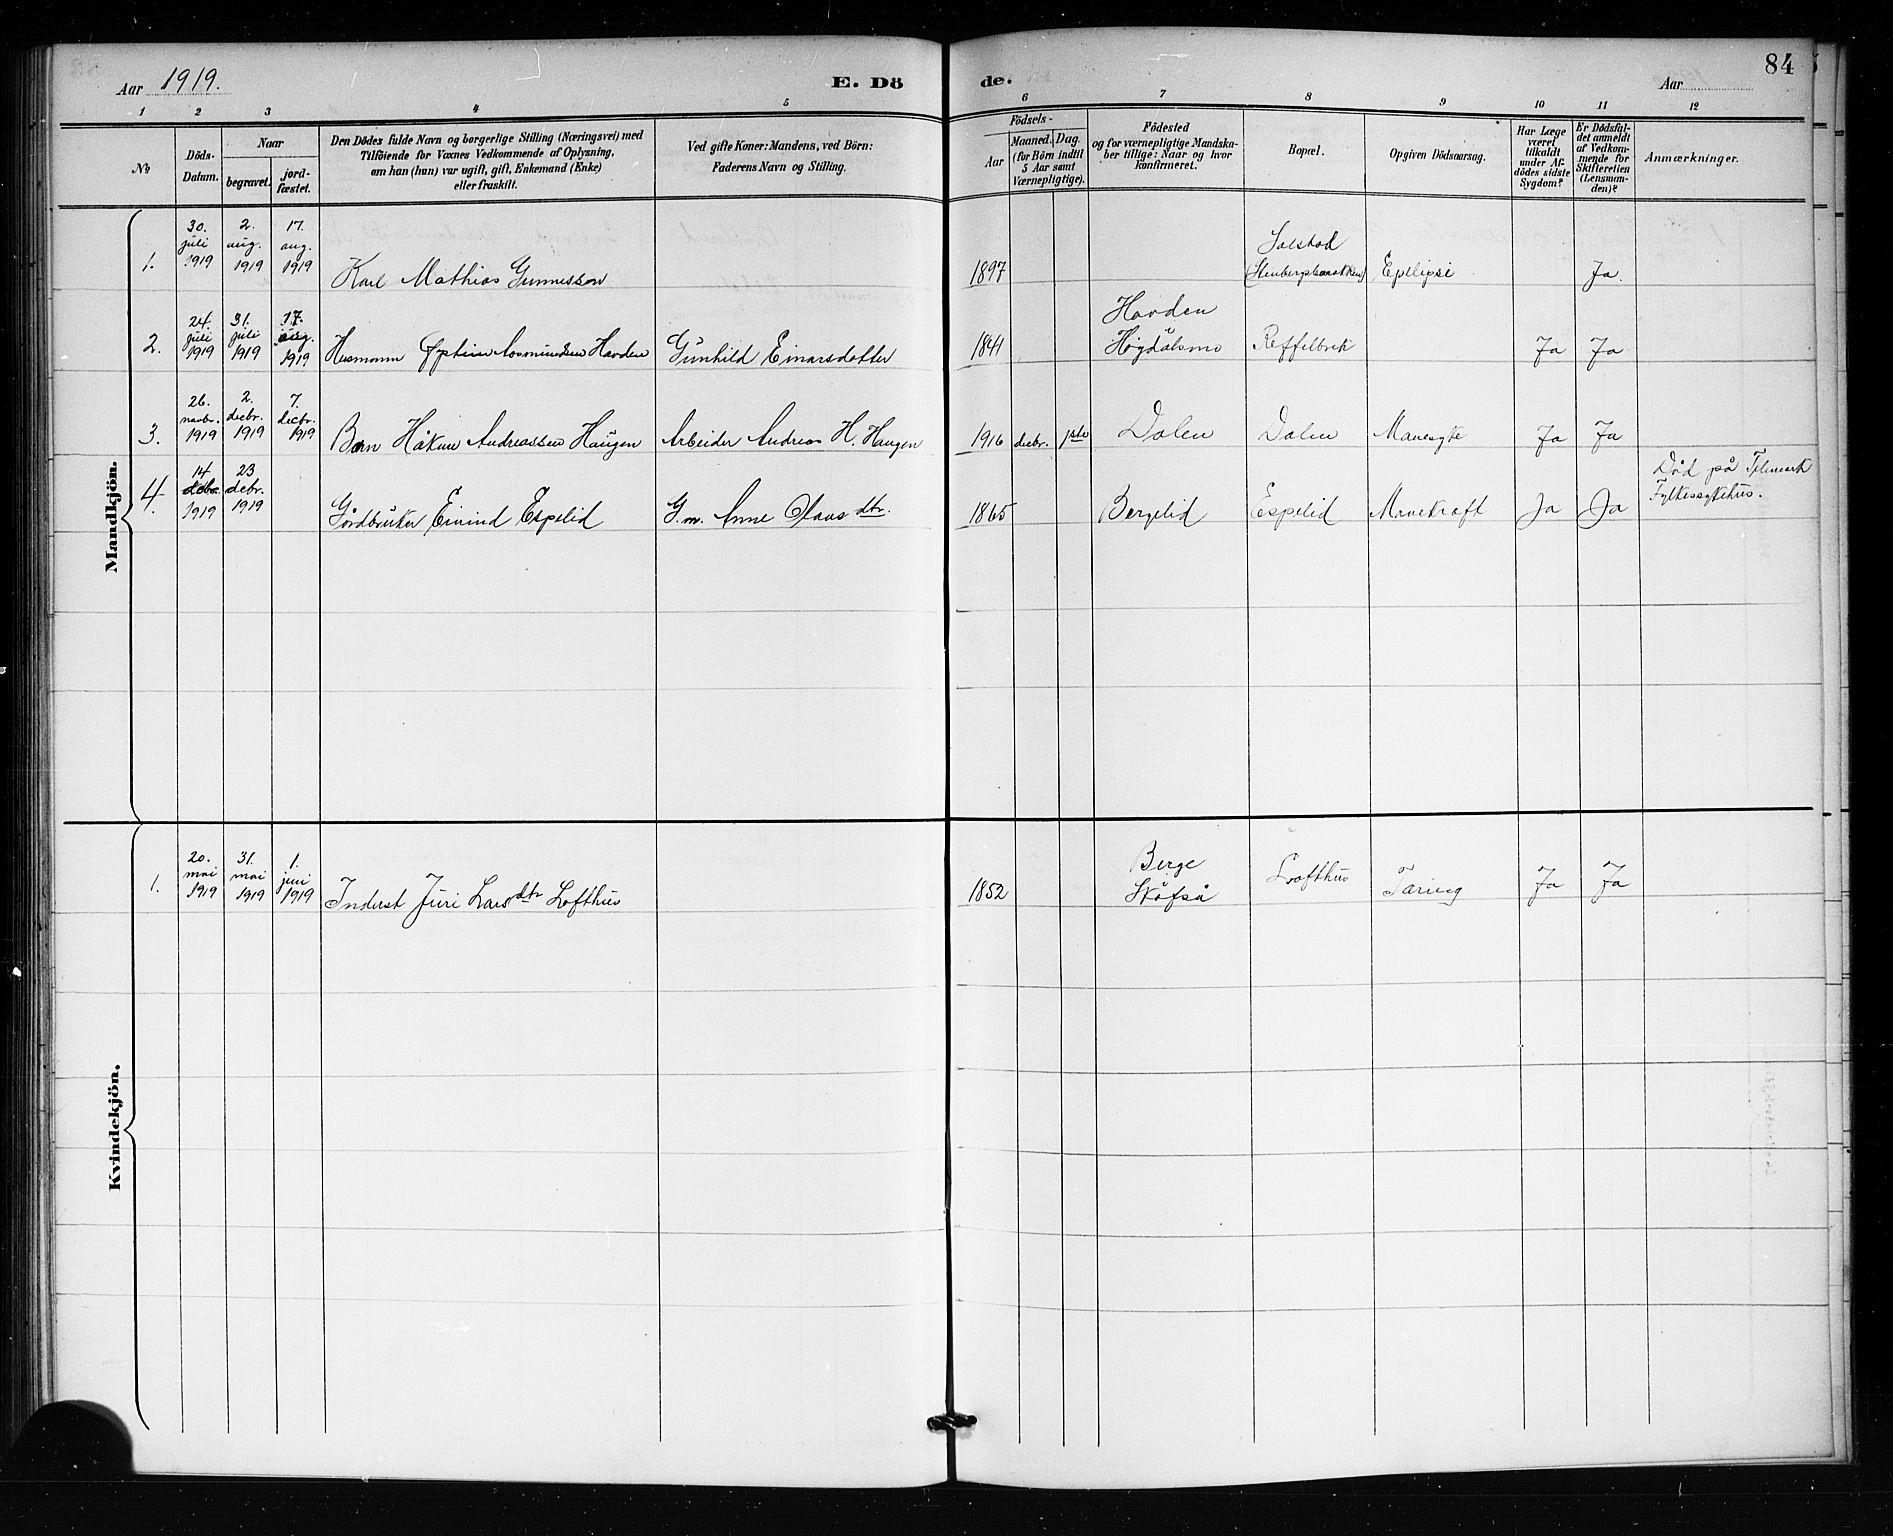 SAKO, Lårdal kirkebøker, G/Gb/L0003: Klokkerbok nr. II 3, 1889-1920, s. 84